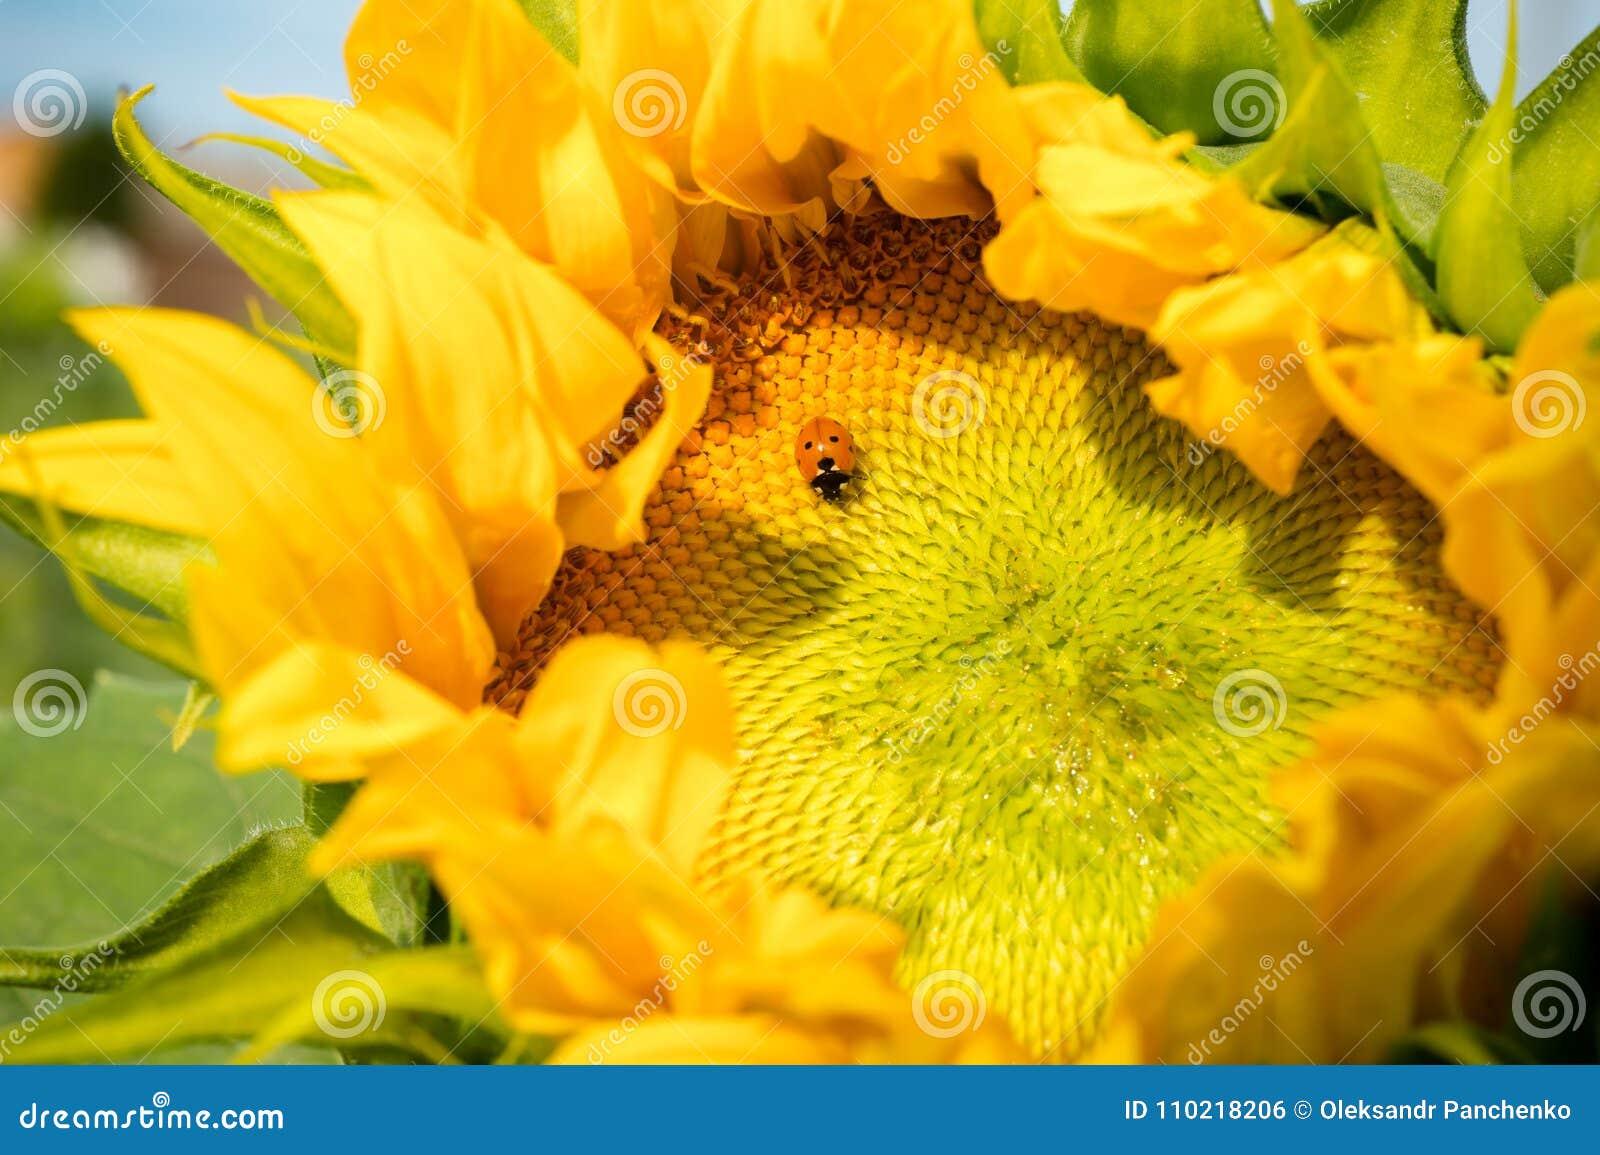 Ladybug sits on beautiful half opened sunflower head with golden